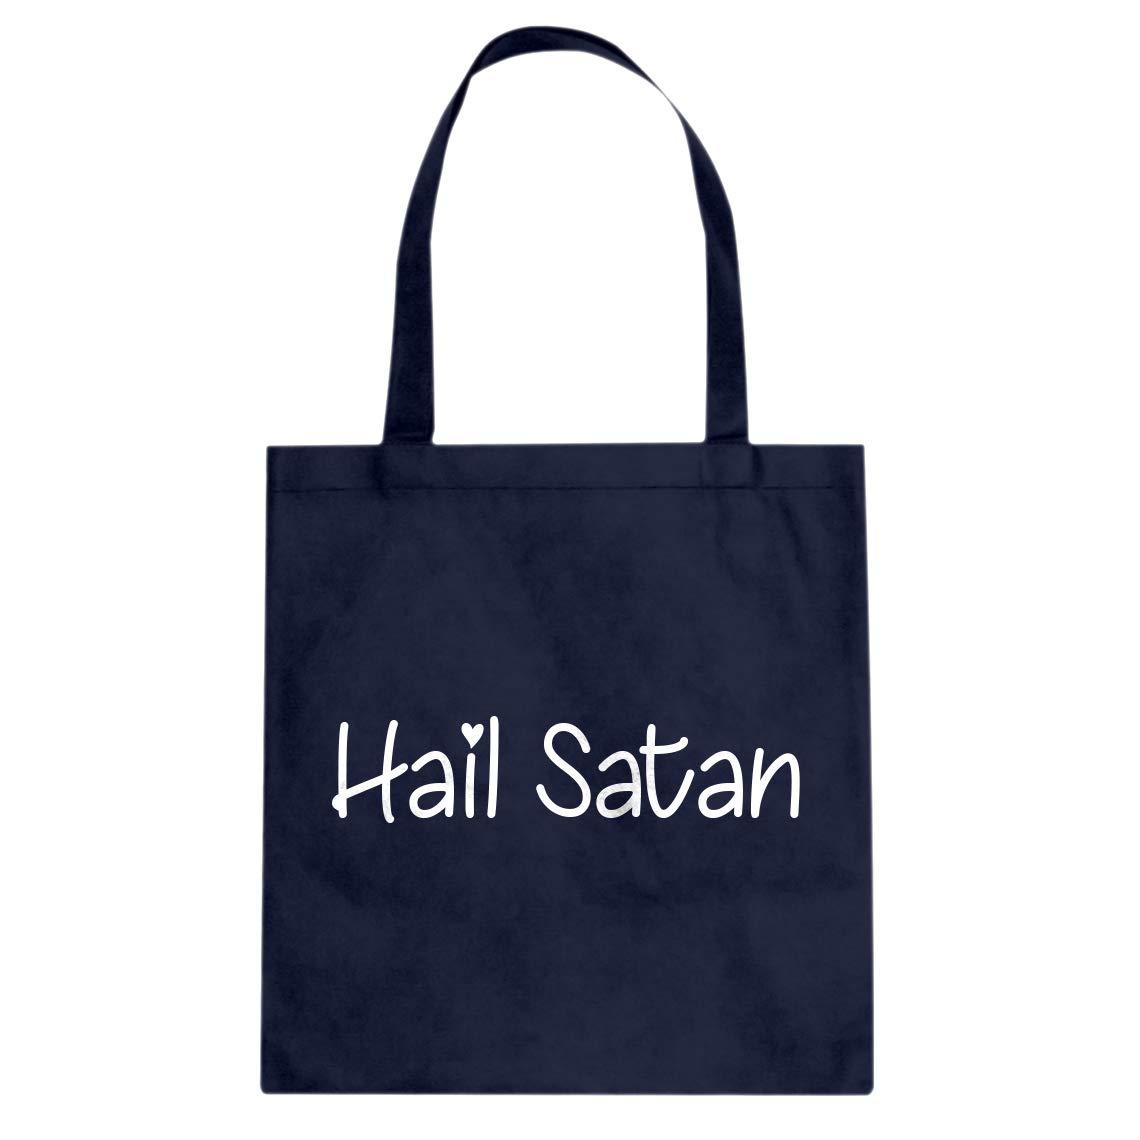 Indica Plateau Hail Satan Cotton Canvas Tote Bag